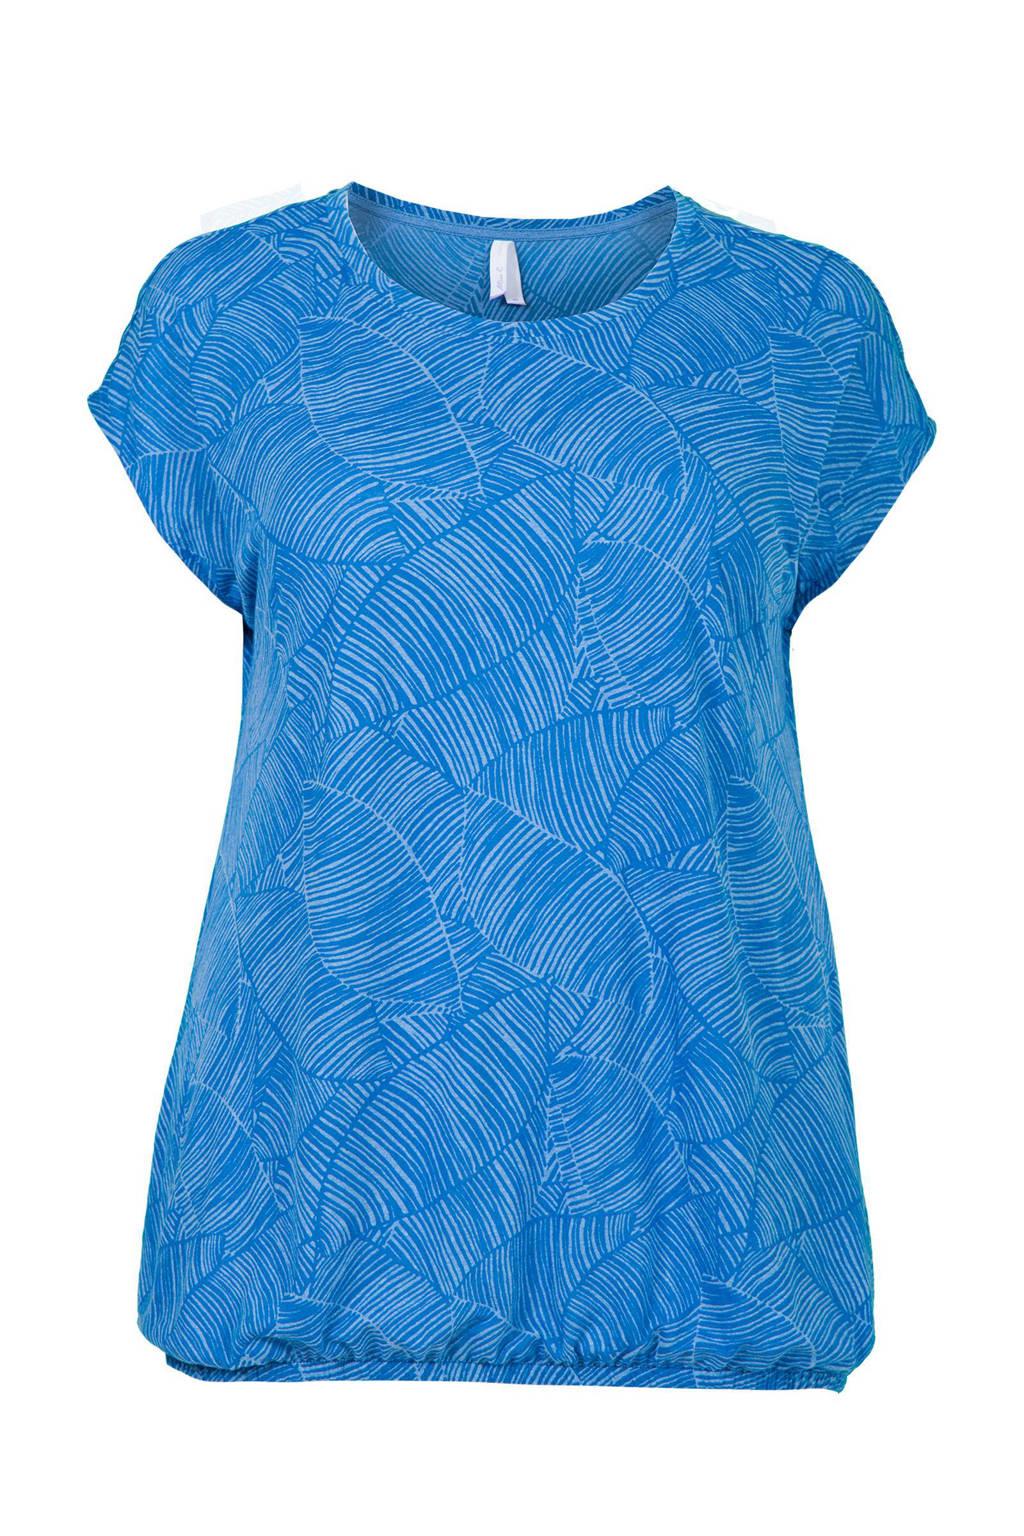 Miss Etam Plus T-shirt met all over print blauw, Blauw